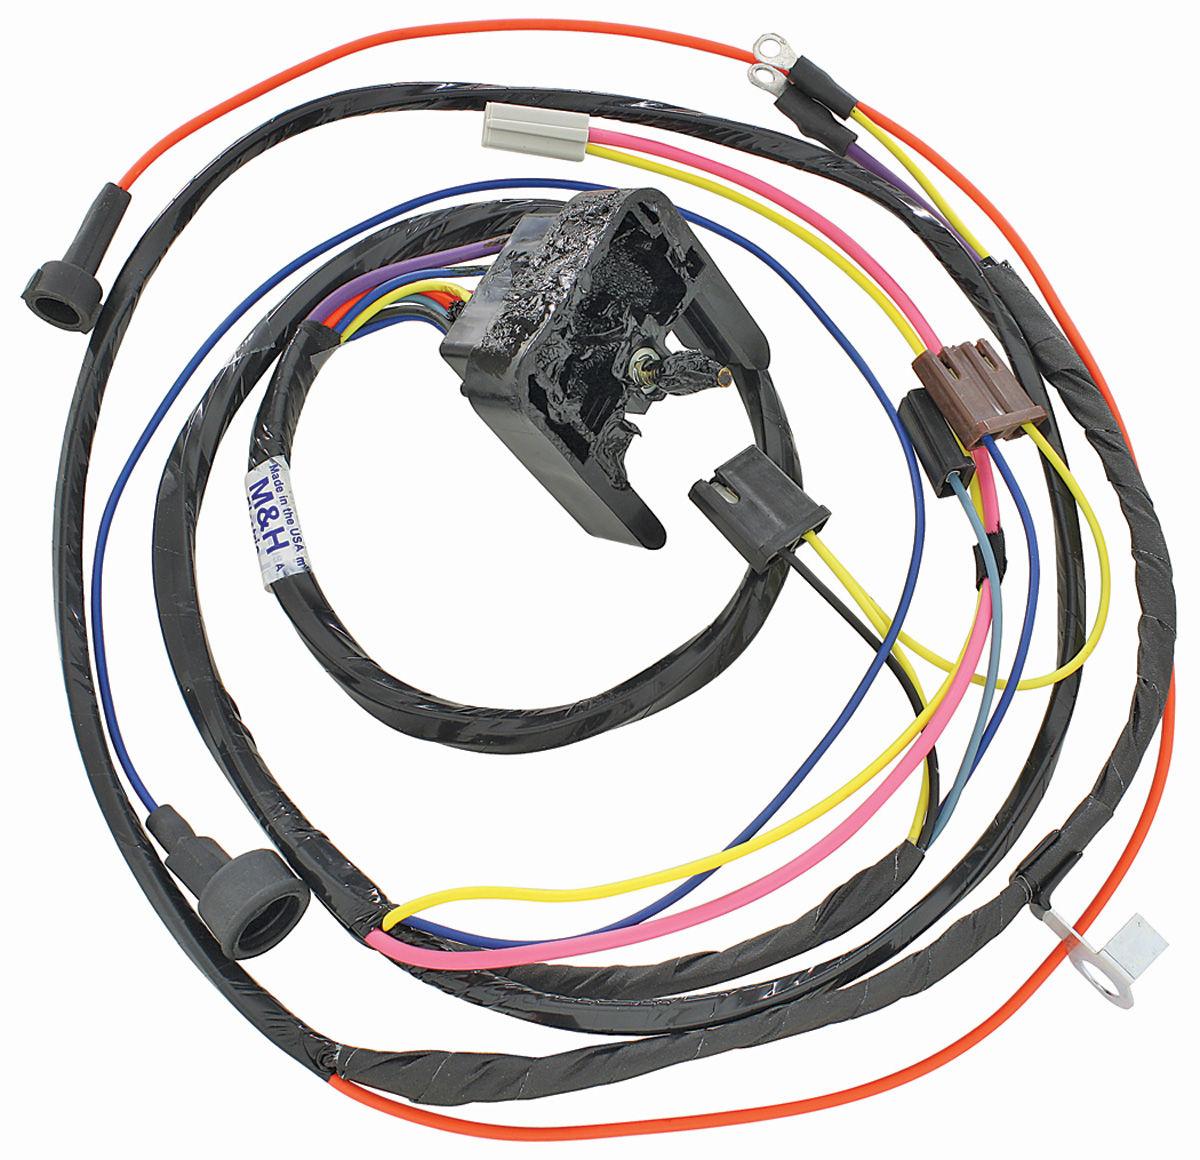 medium resolution of 1970 chevelle engine wiring harness likewise 1970 1970 chevelle engine schema wiring diagram